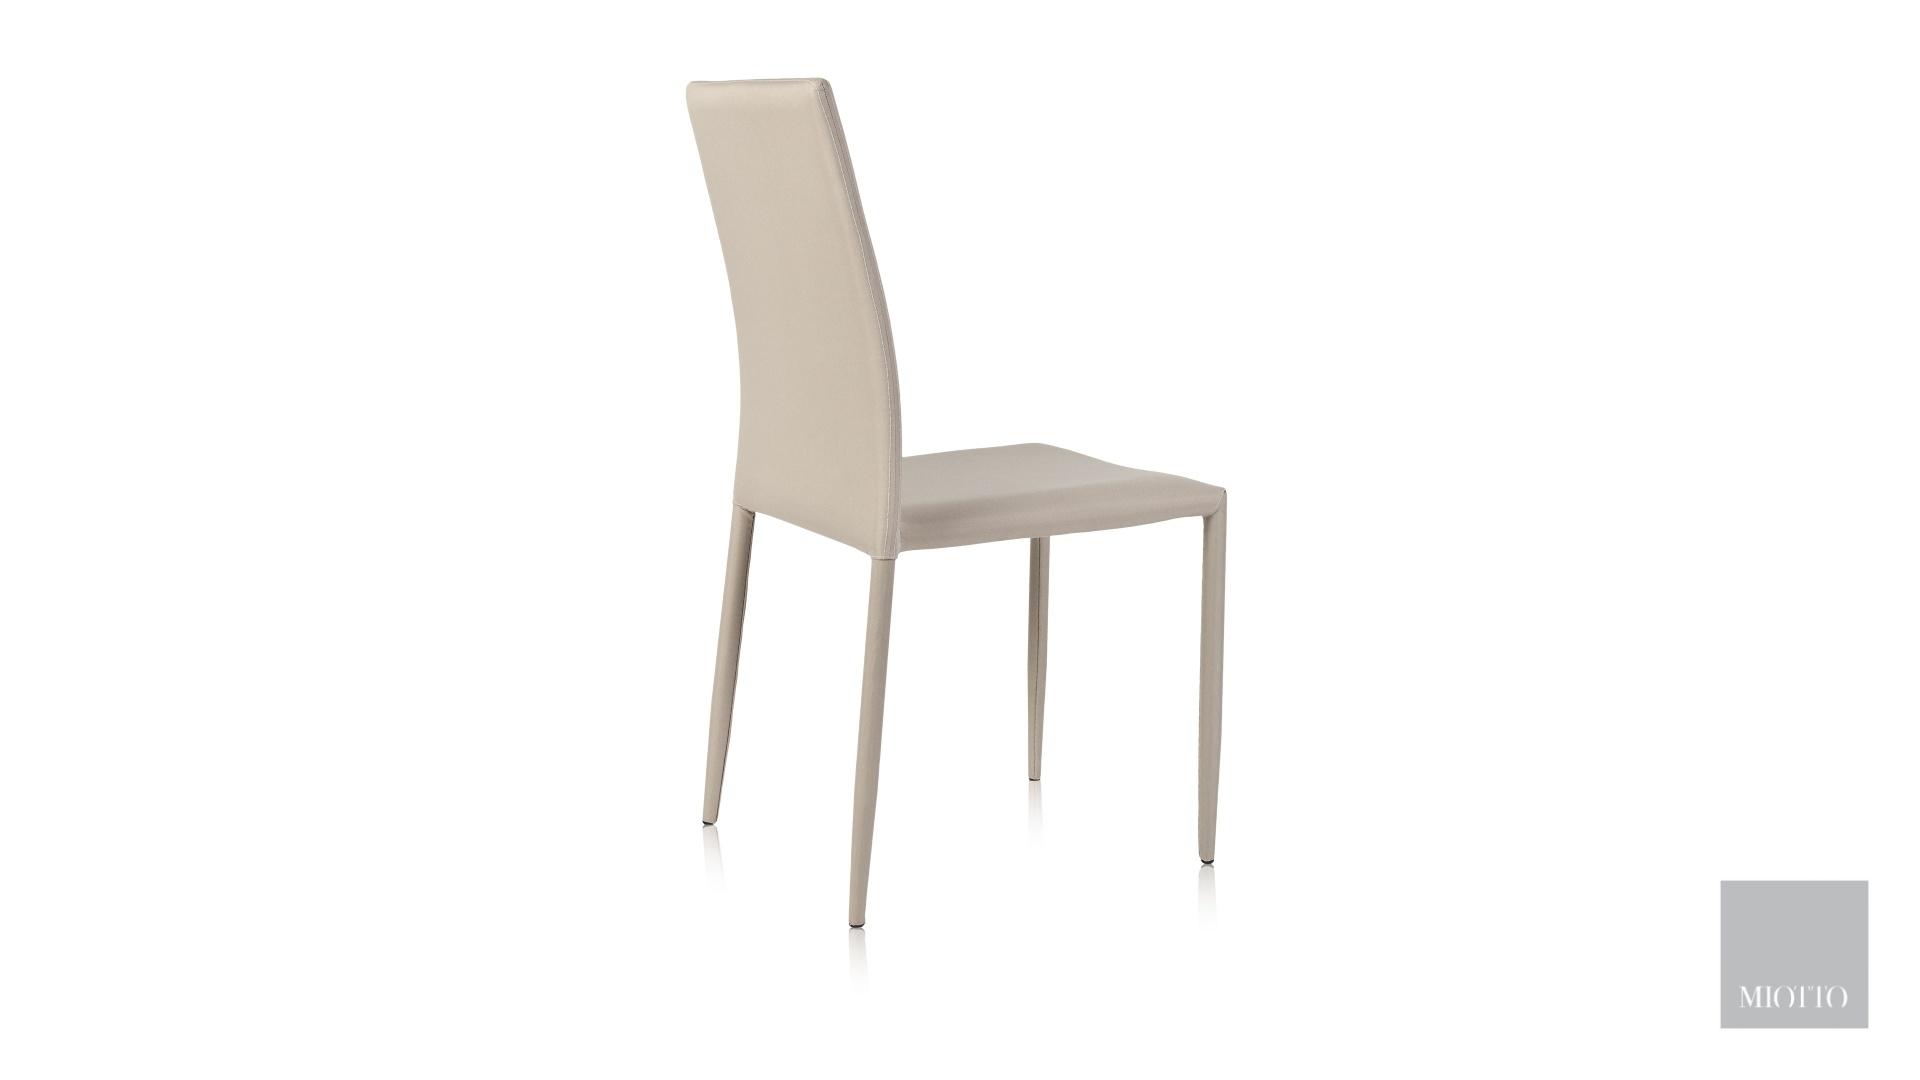 miotto_Lara fabric dining chair cream back miotto furniture